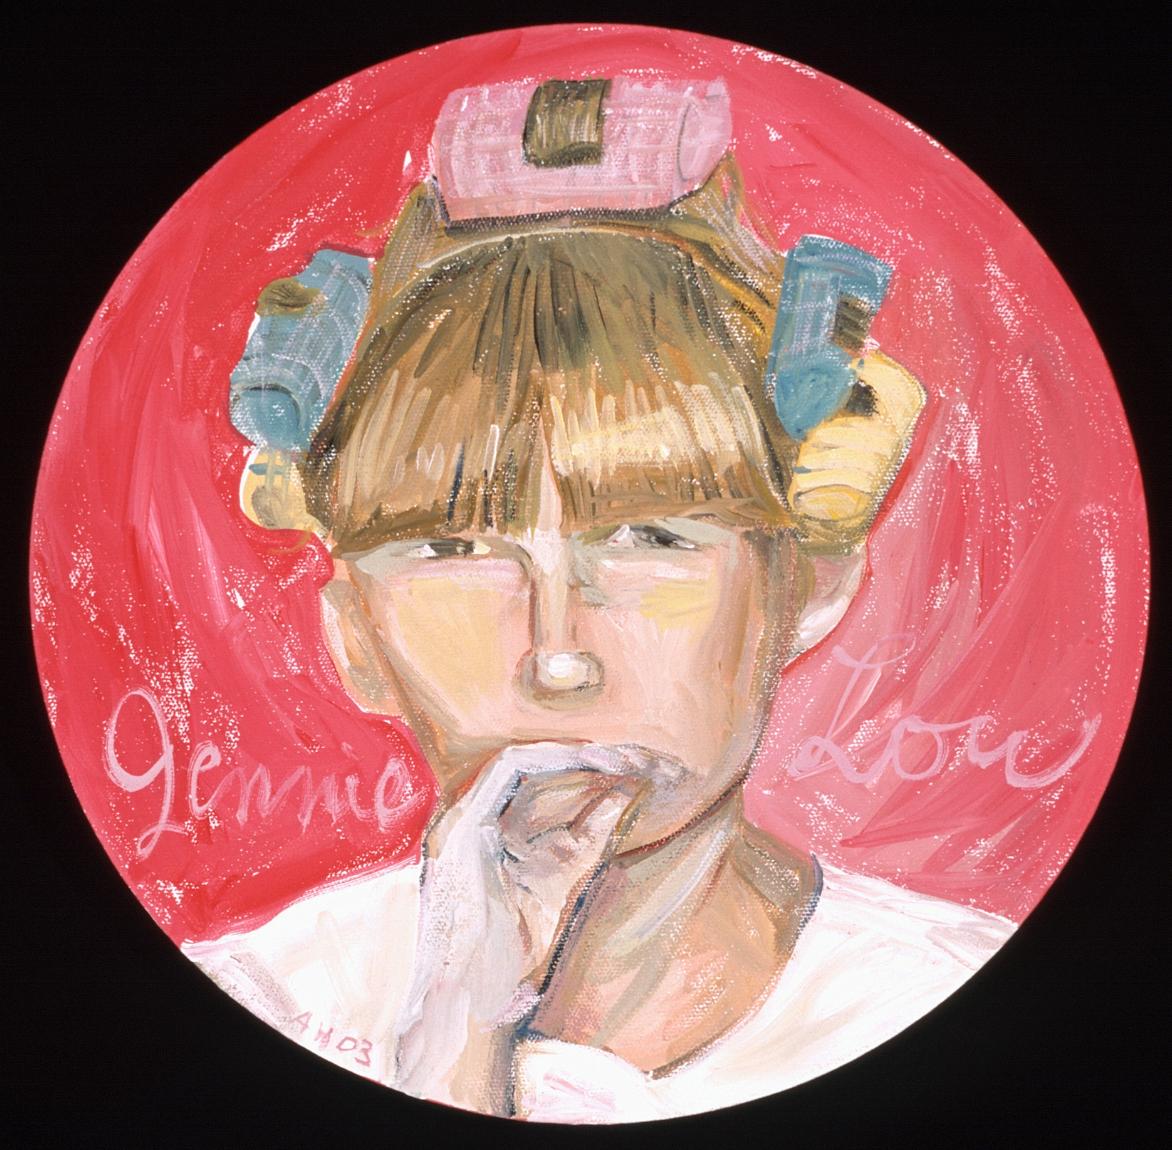 Jennie Lou - Curlers - 1967